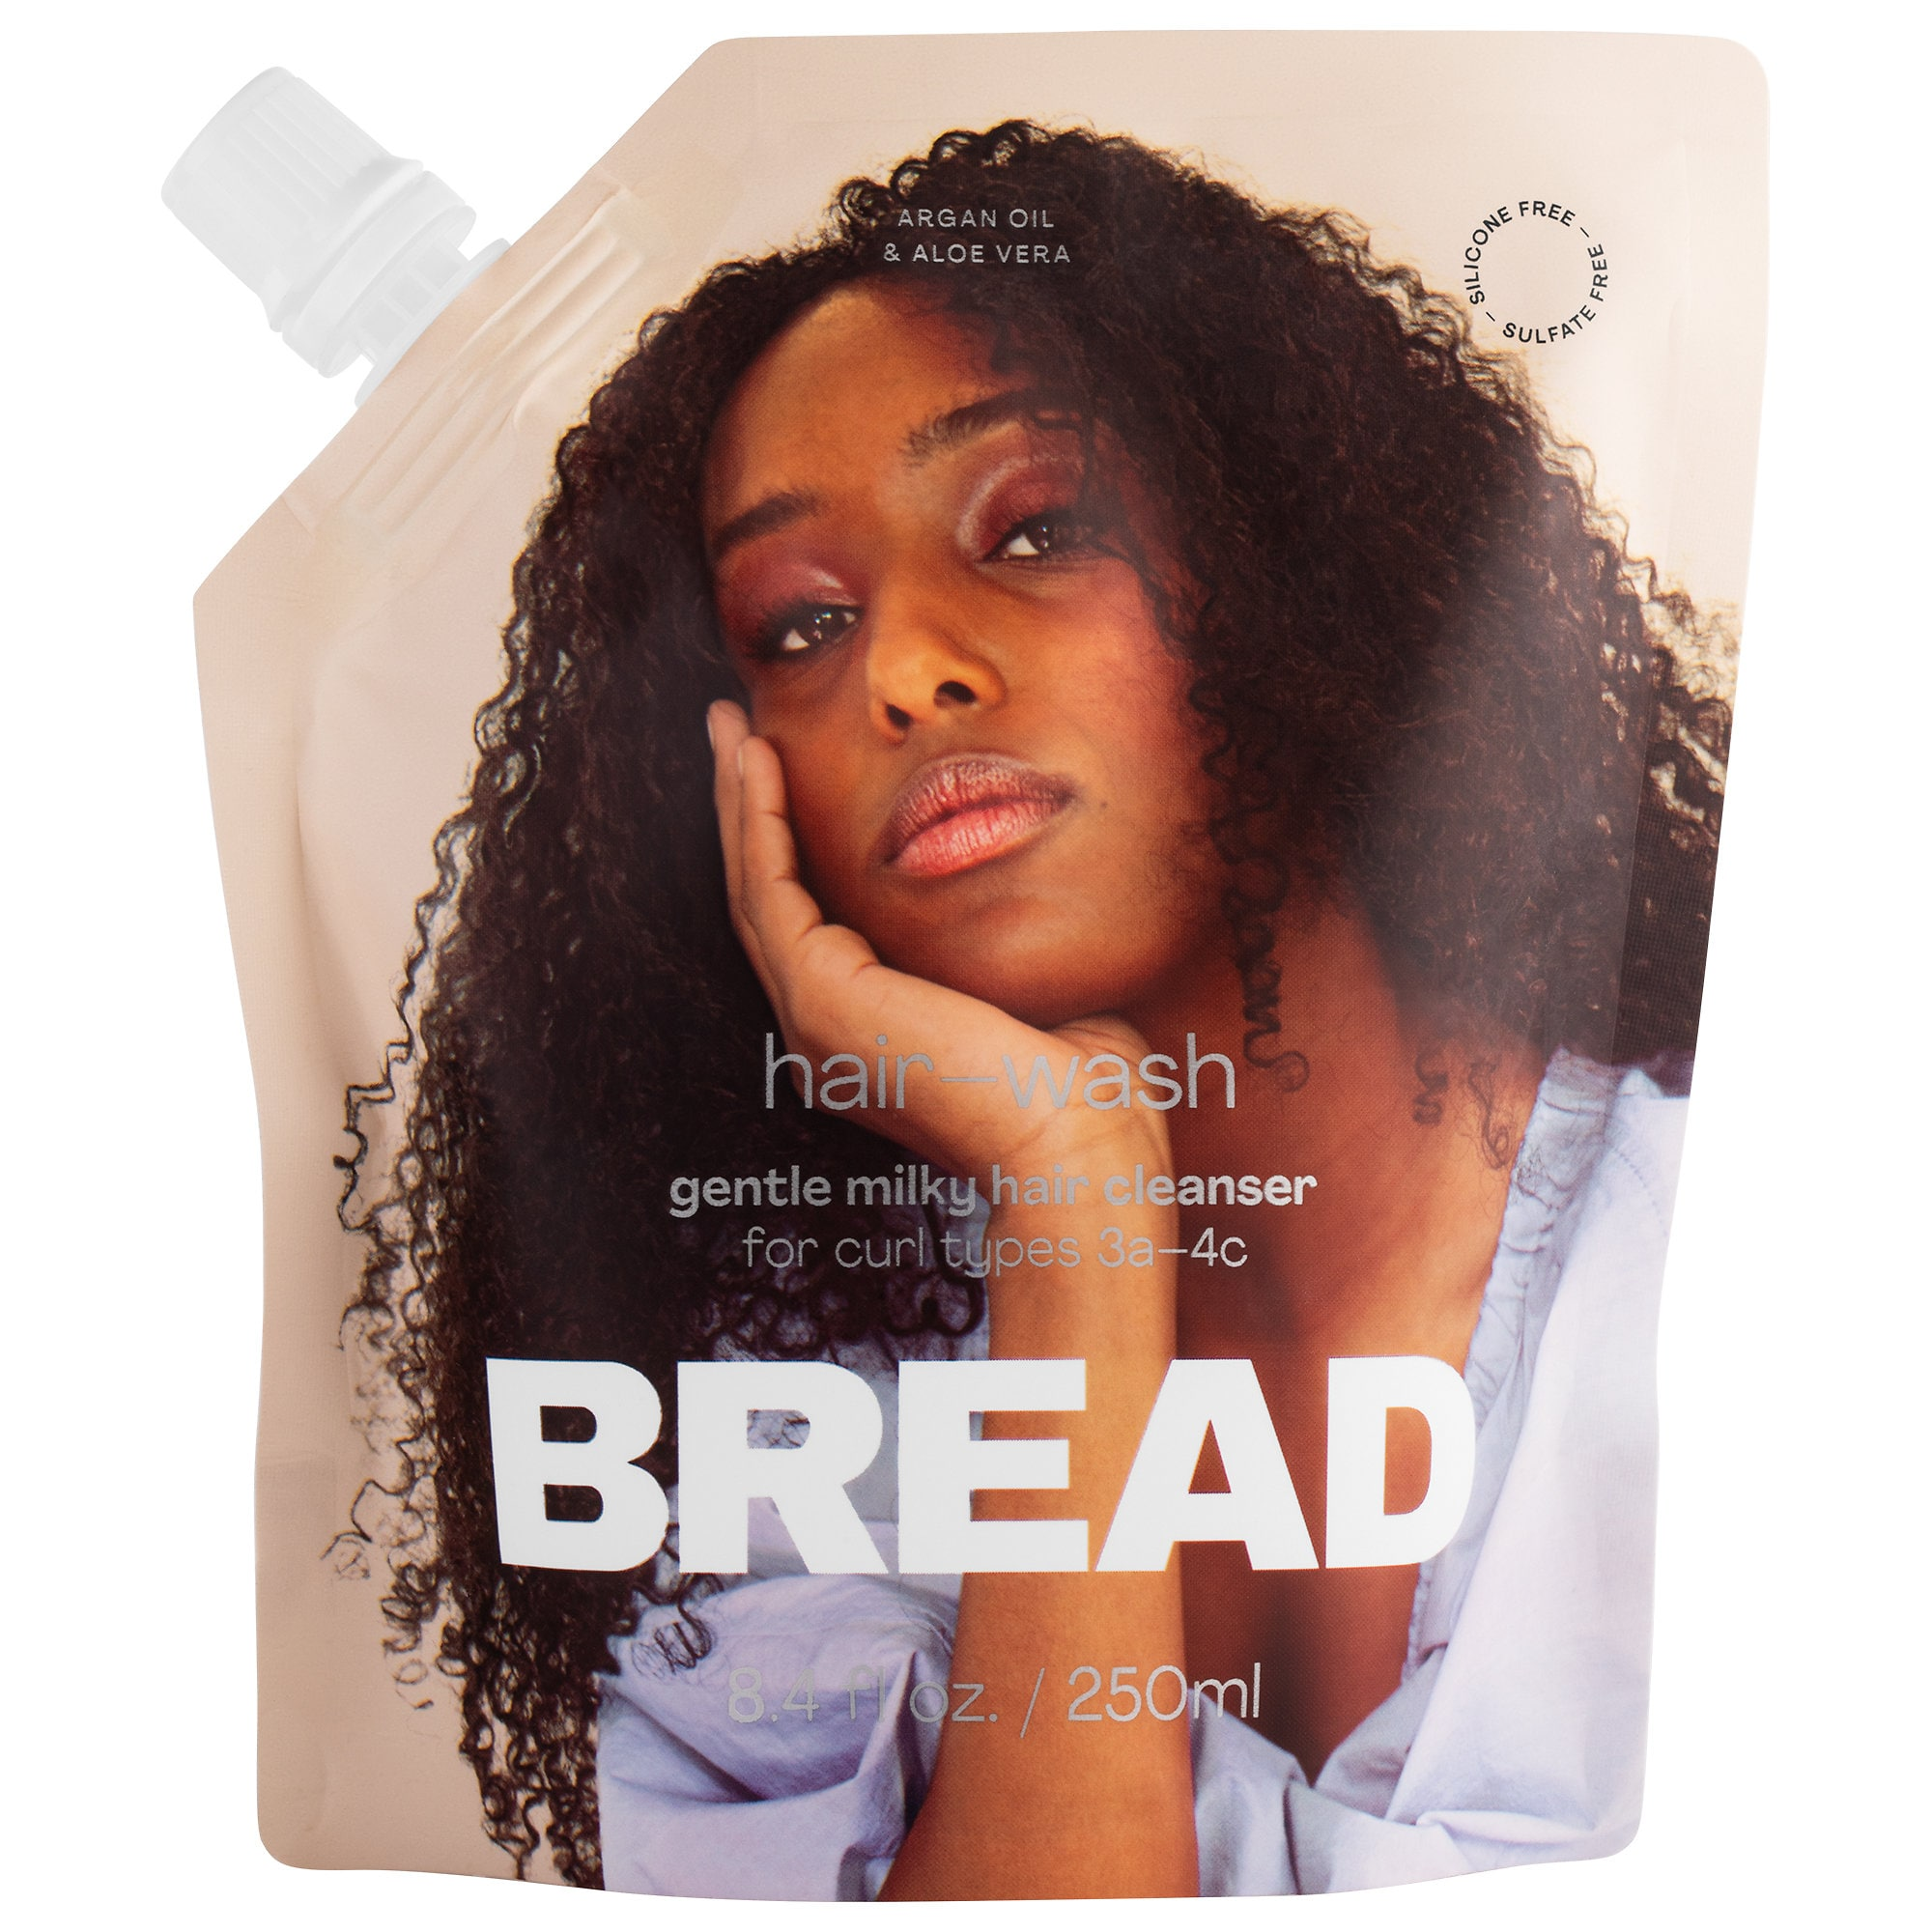 Bread Beauty Supply - Hair Wash Gentle Milky Hair Cleanser